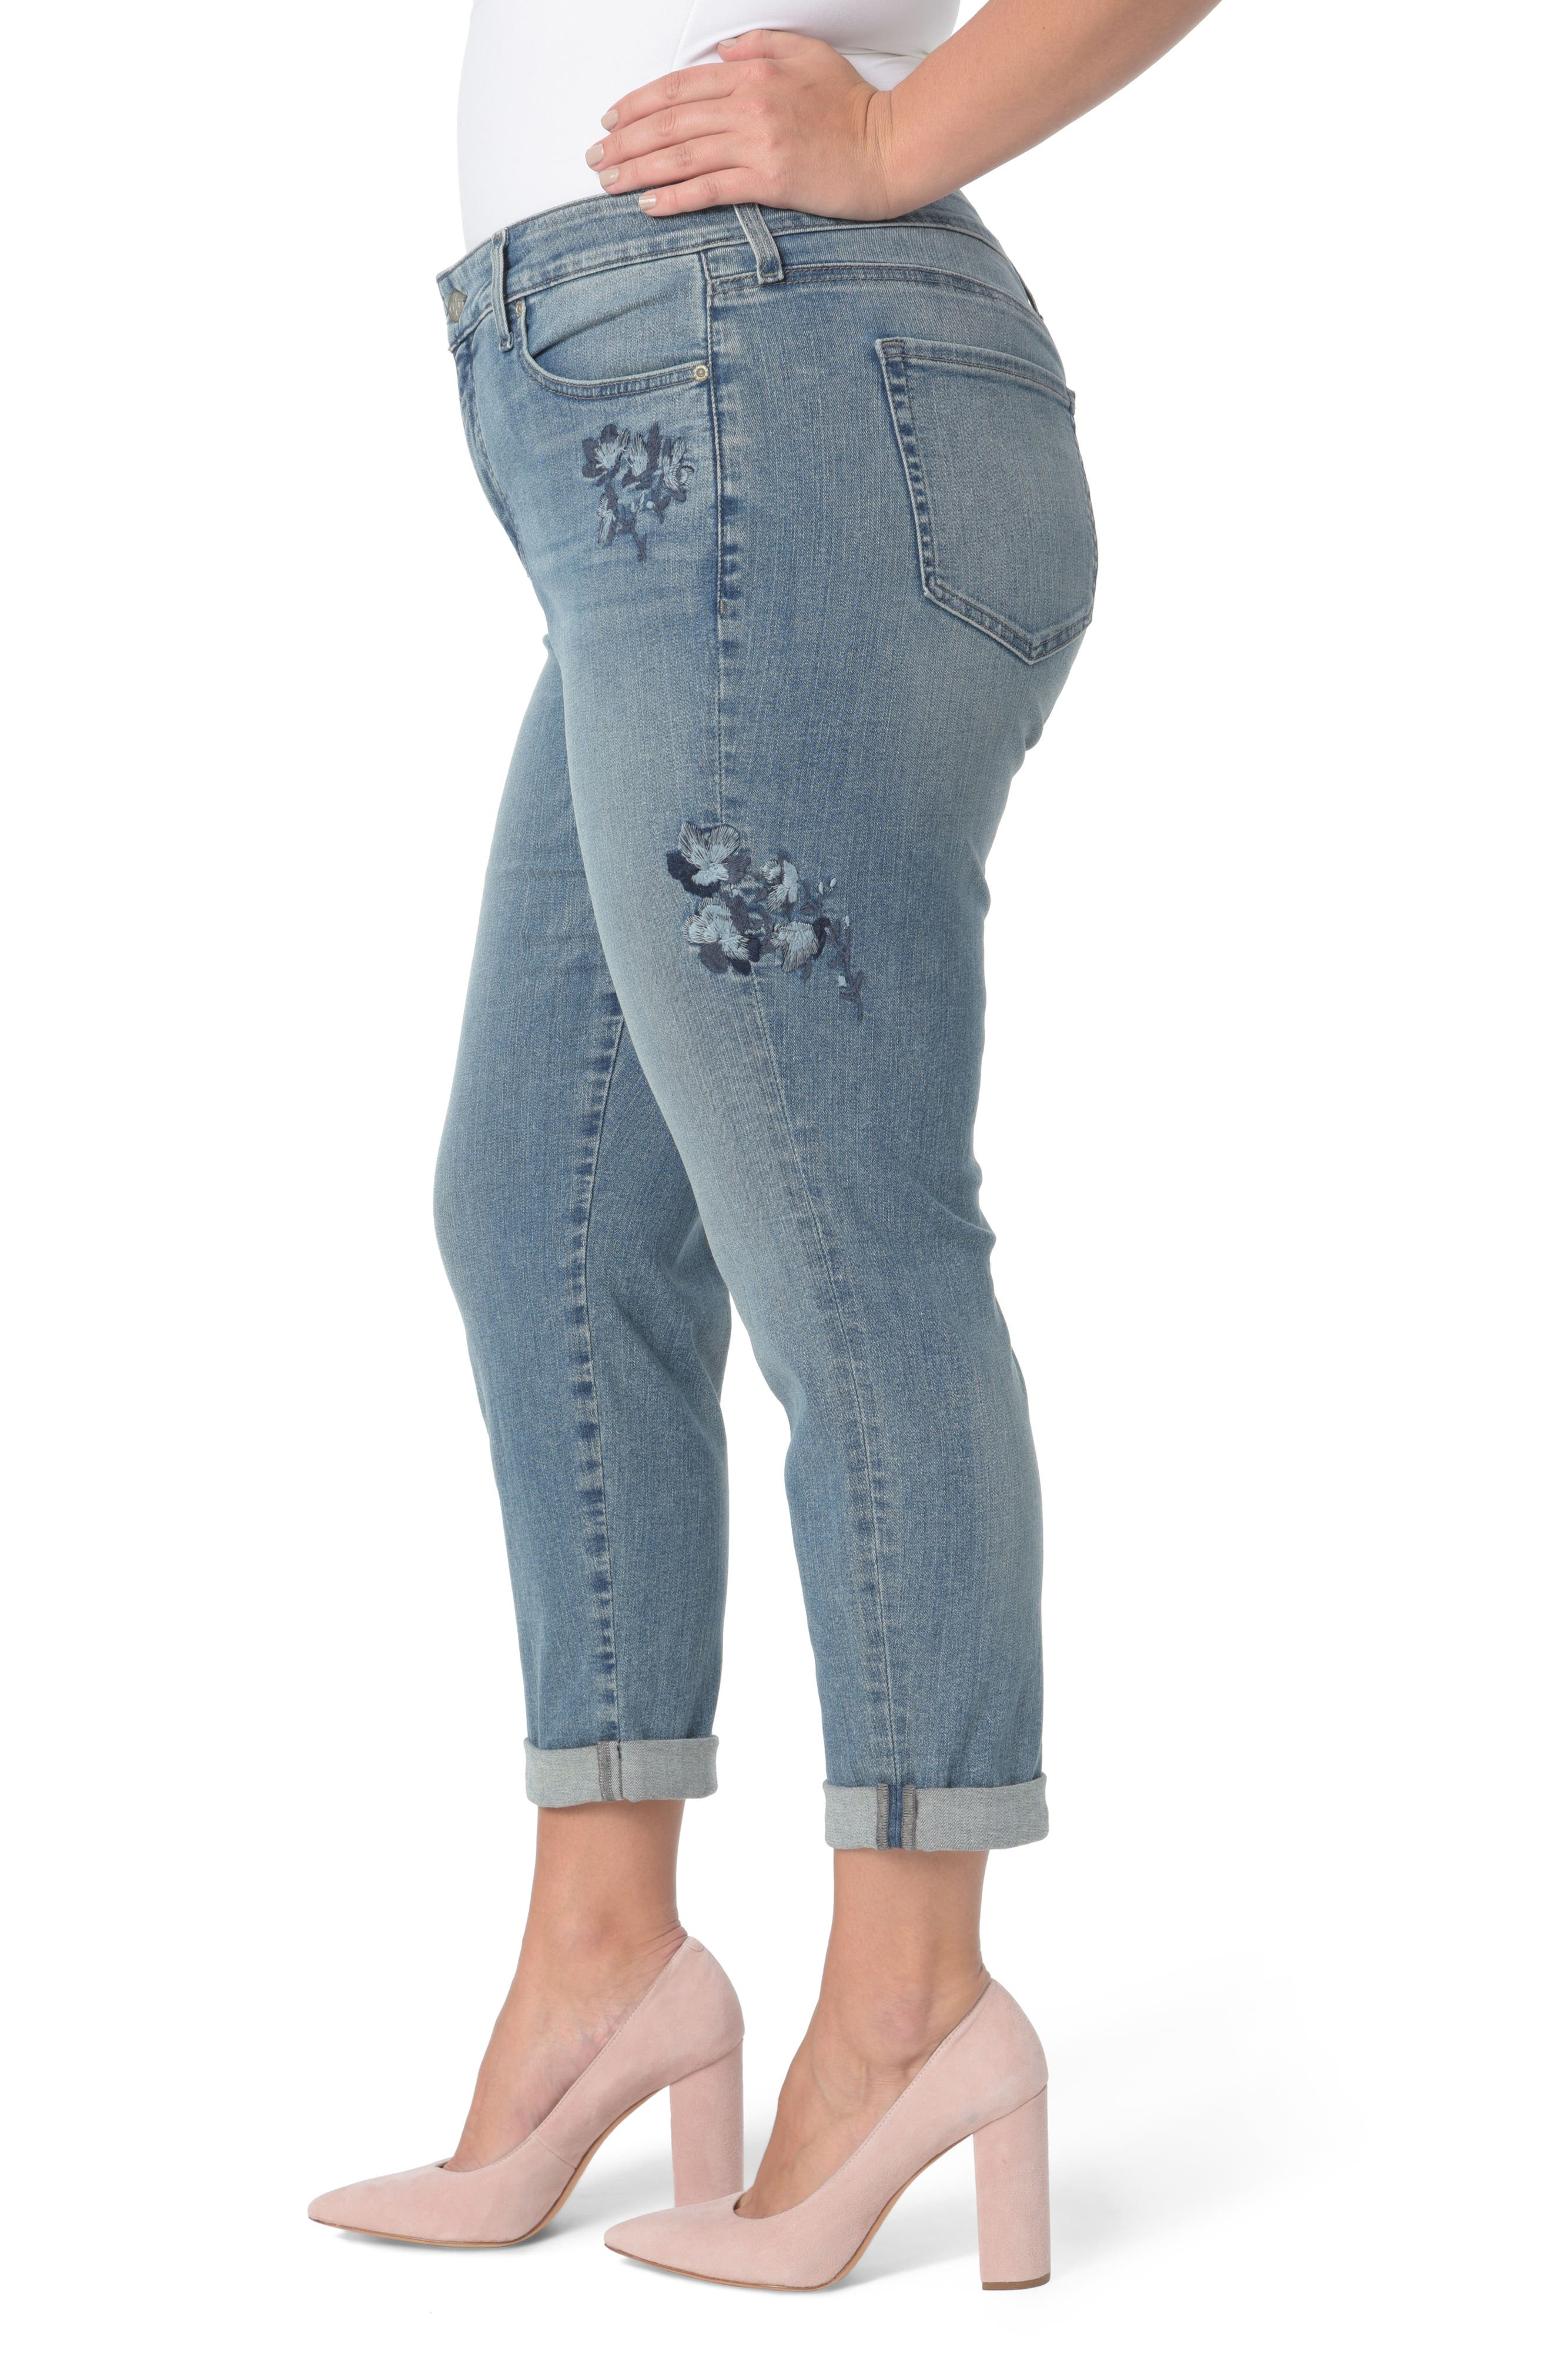 Alternate Image 3  - NYDJ Floral Embroidery Boyfriend Jeans (Pacific) (Plus Size)